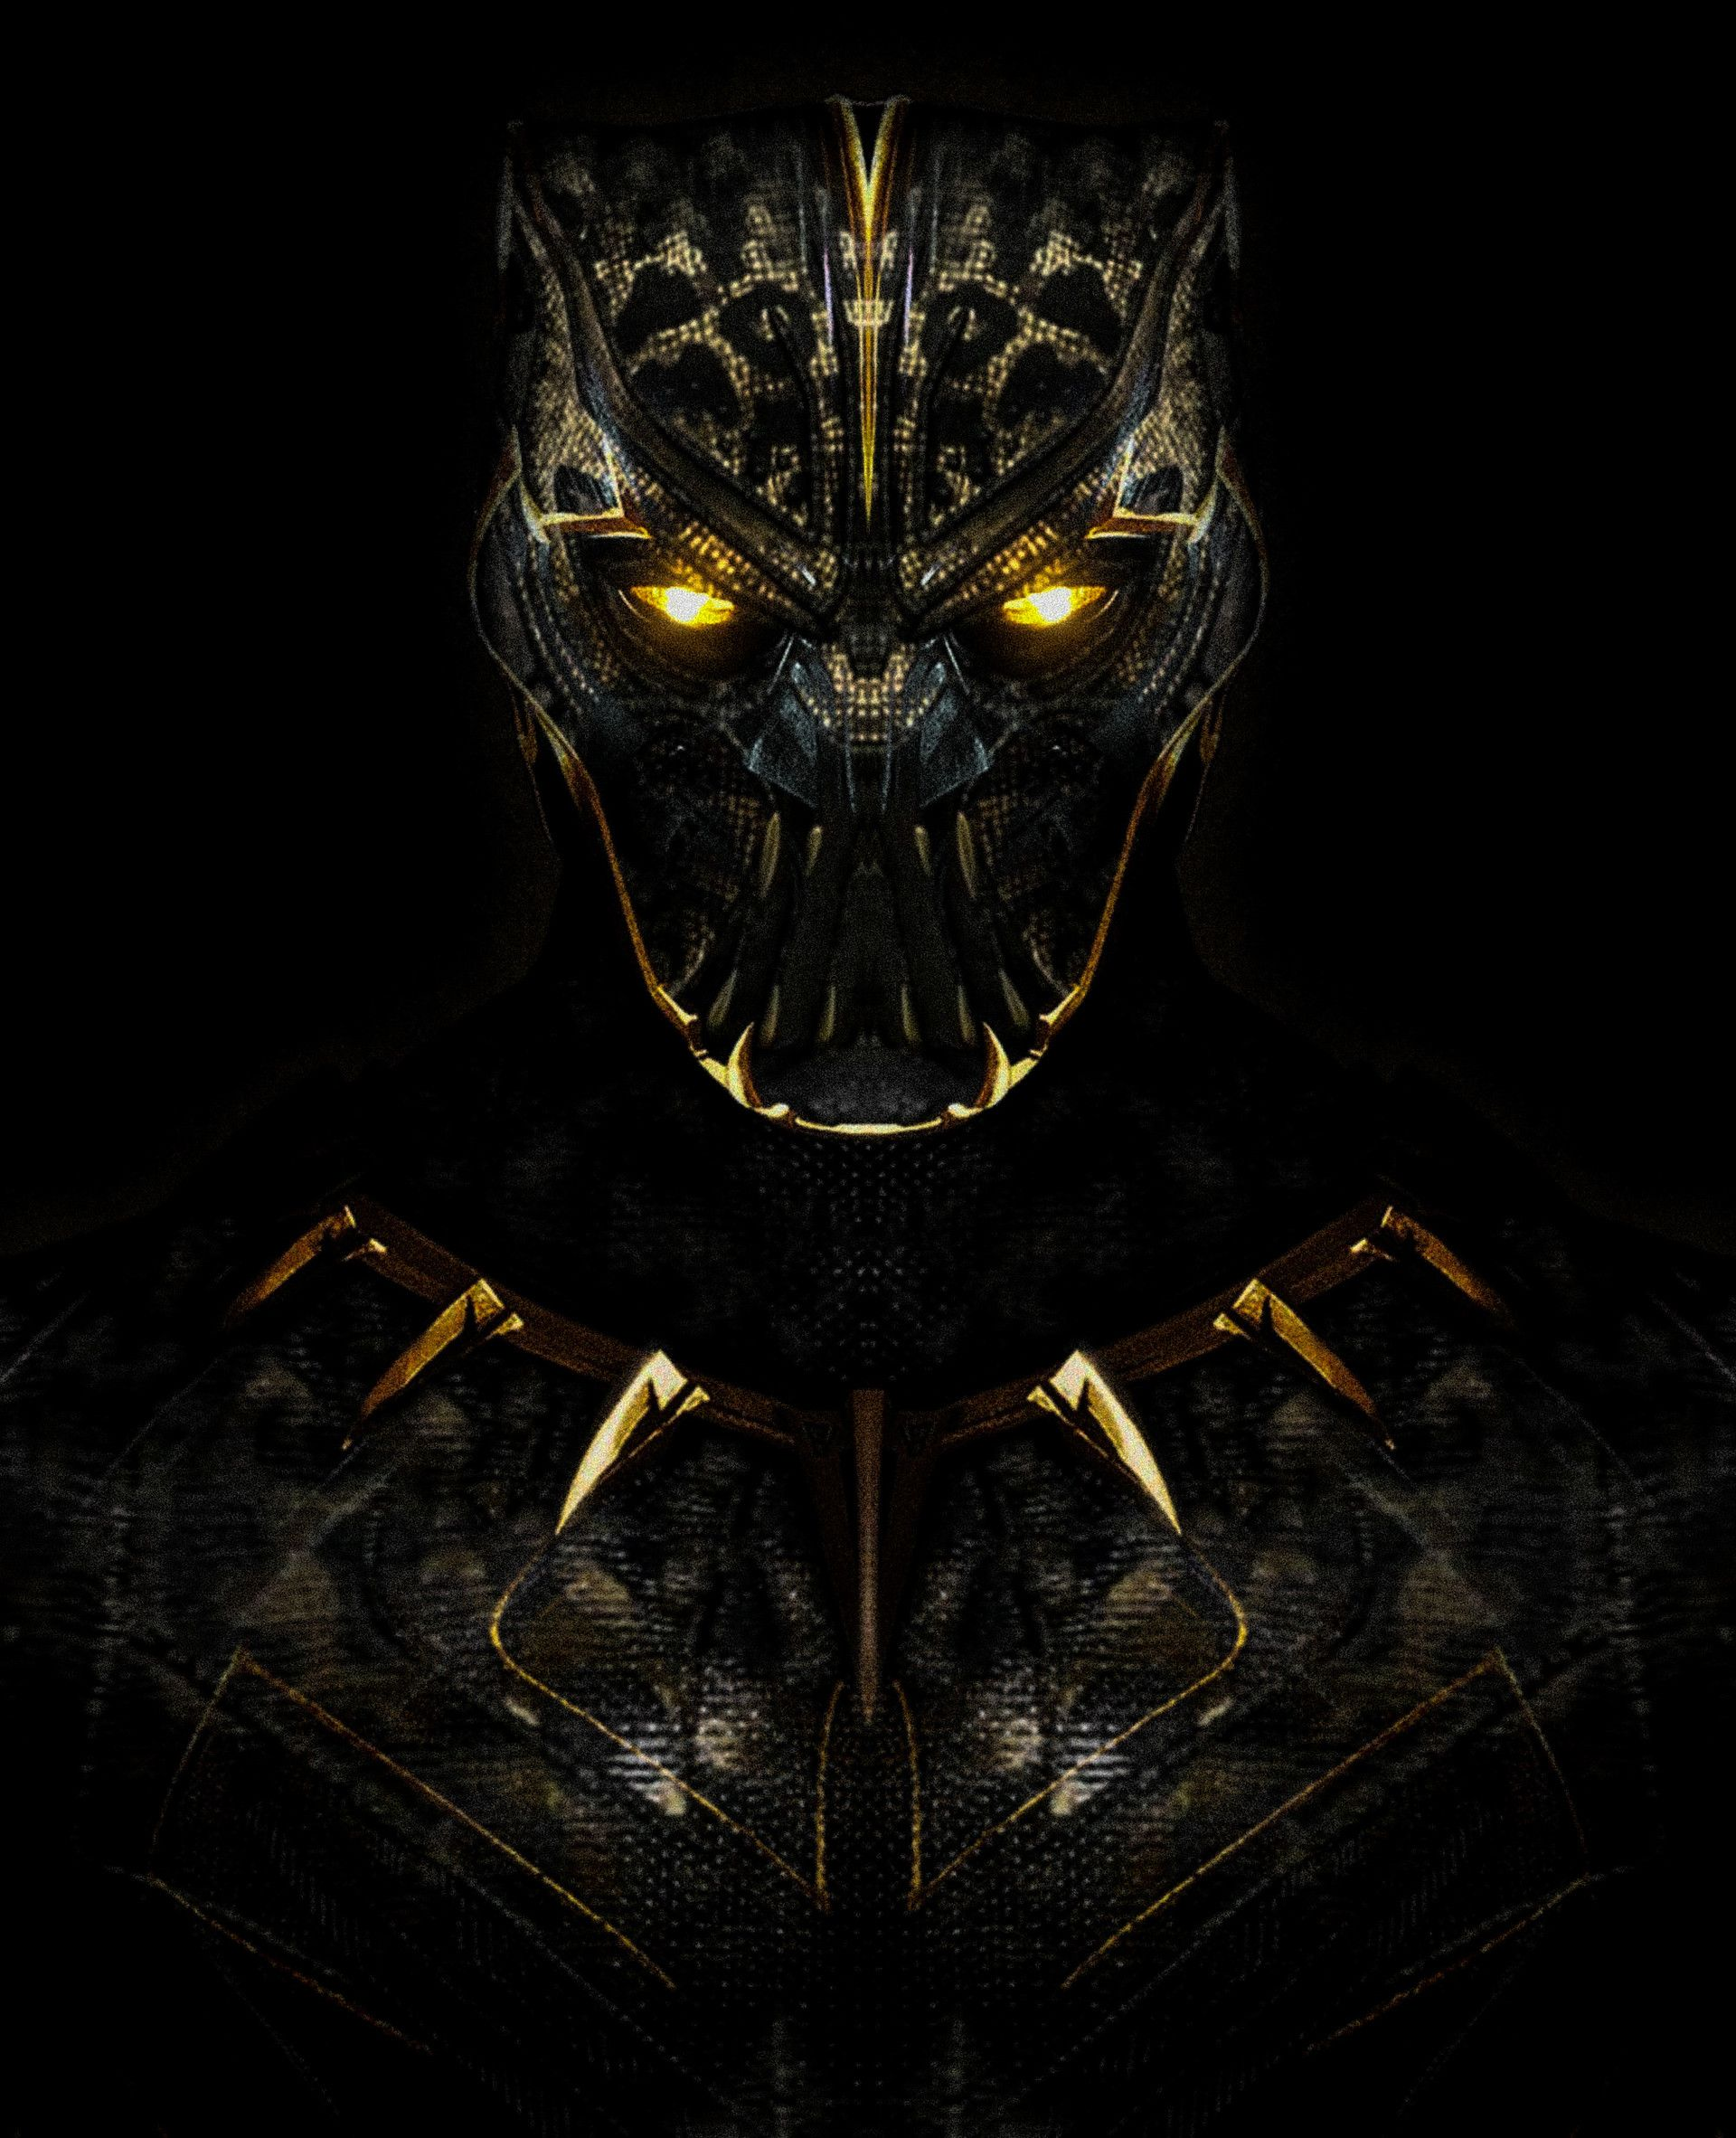 Pin By Adrian Edwards Ii On Marvel Black Panther Marvel Black Panther Art Black Panther